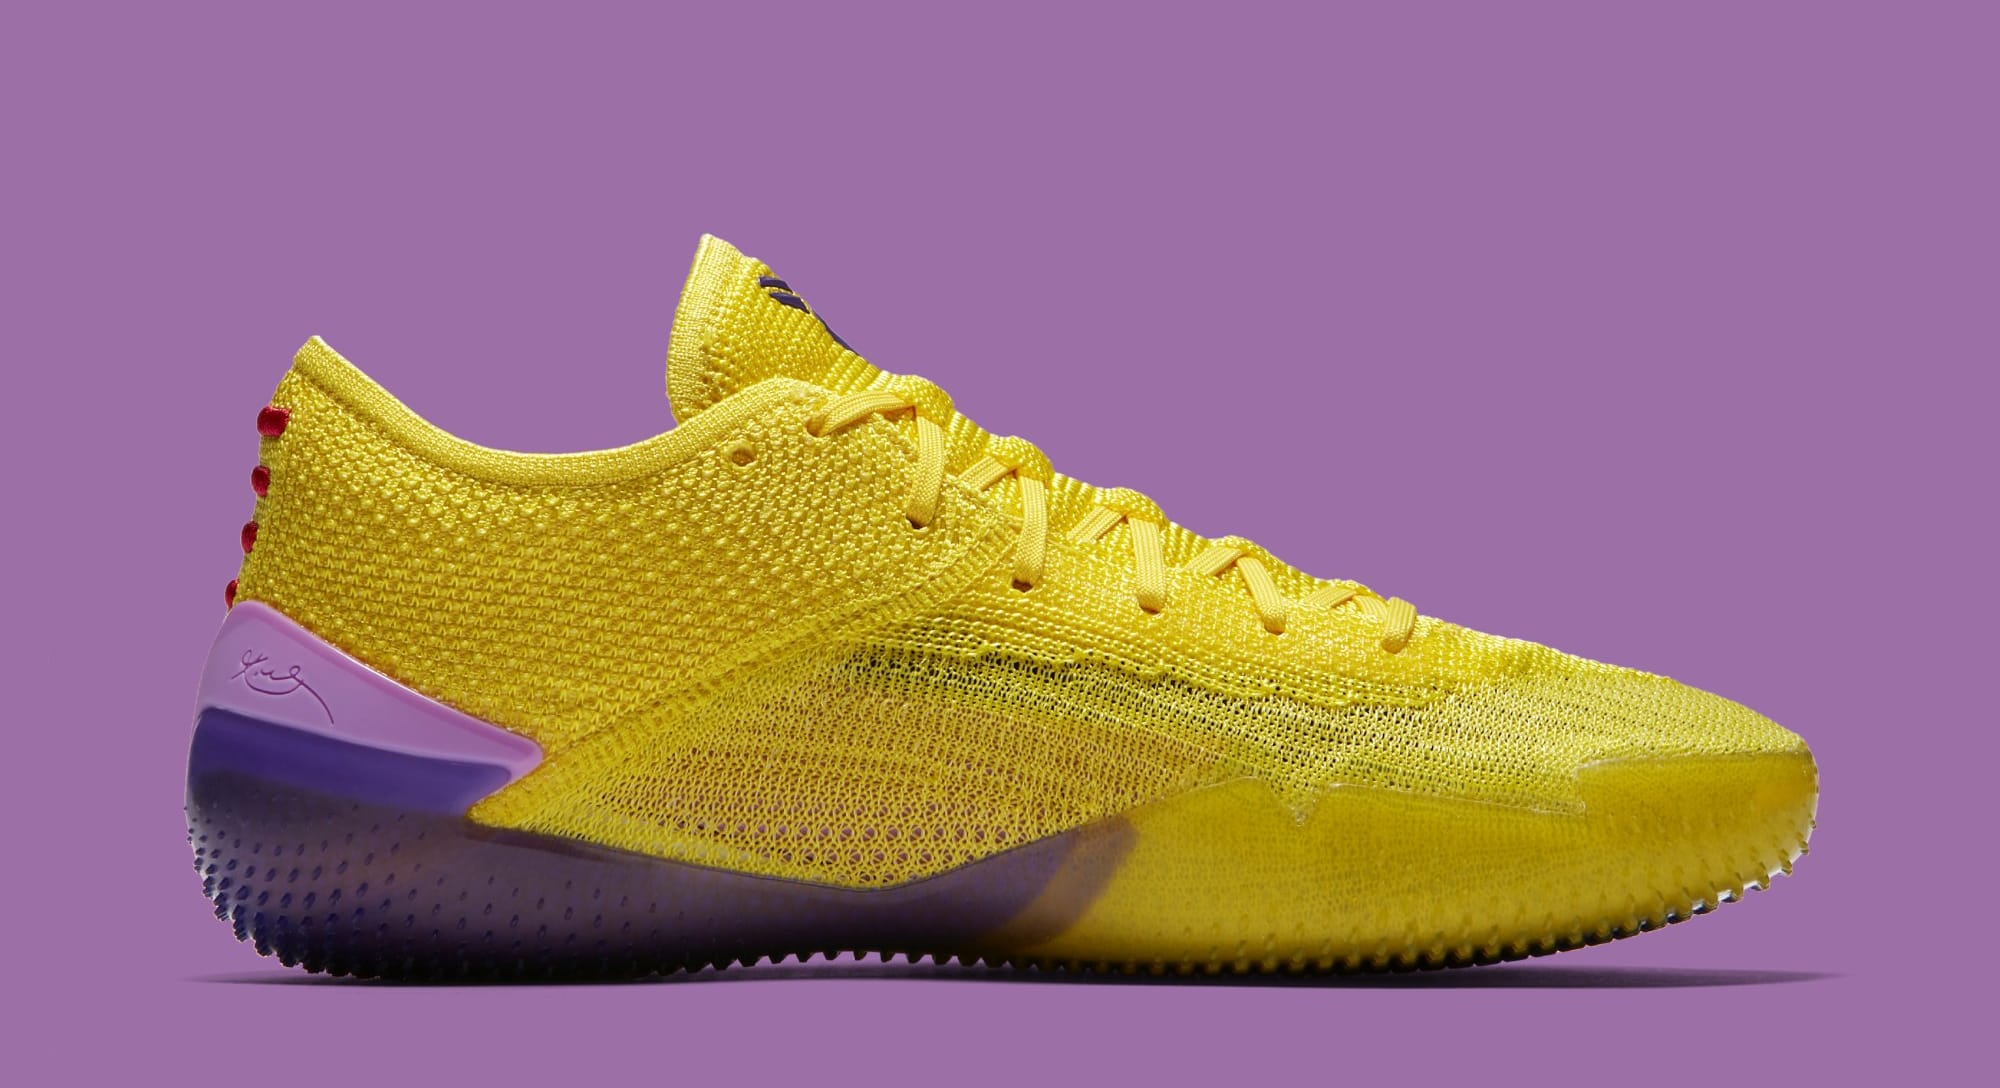 62dcdef66674 Image via Nike Nike Kobe AD NXT 360  Yellow Strike White  AQ1087-100 (Medial